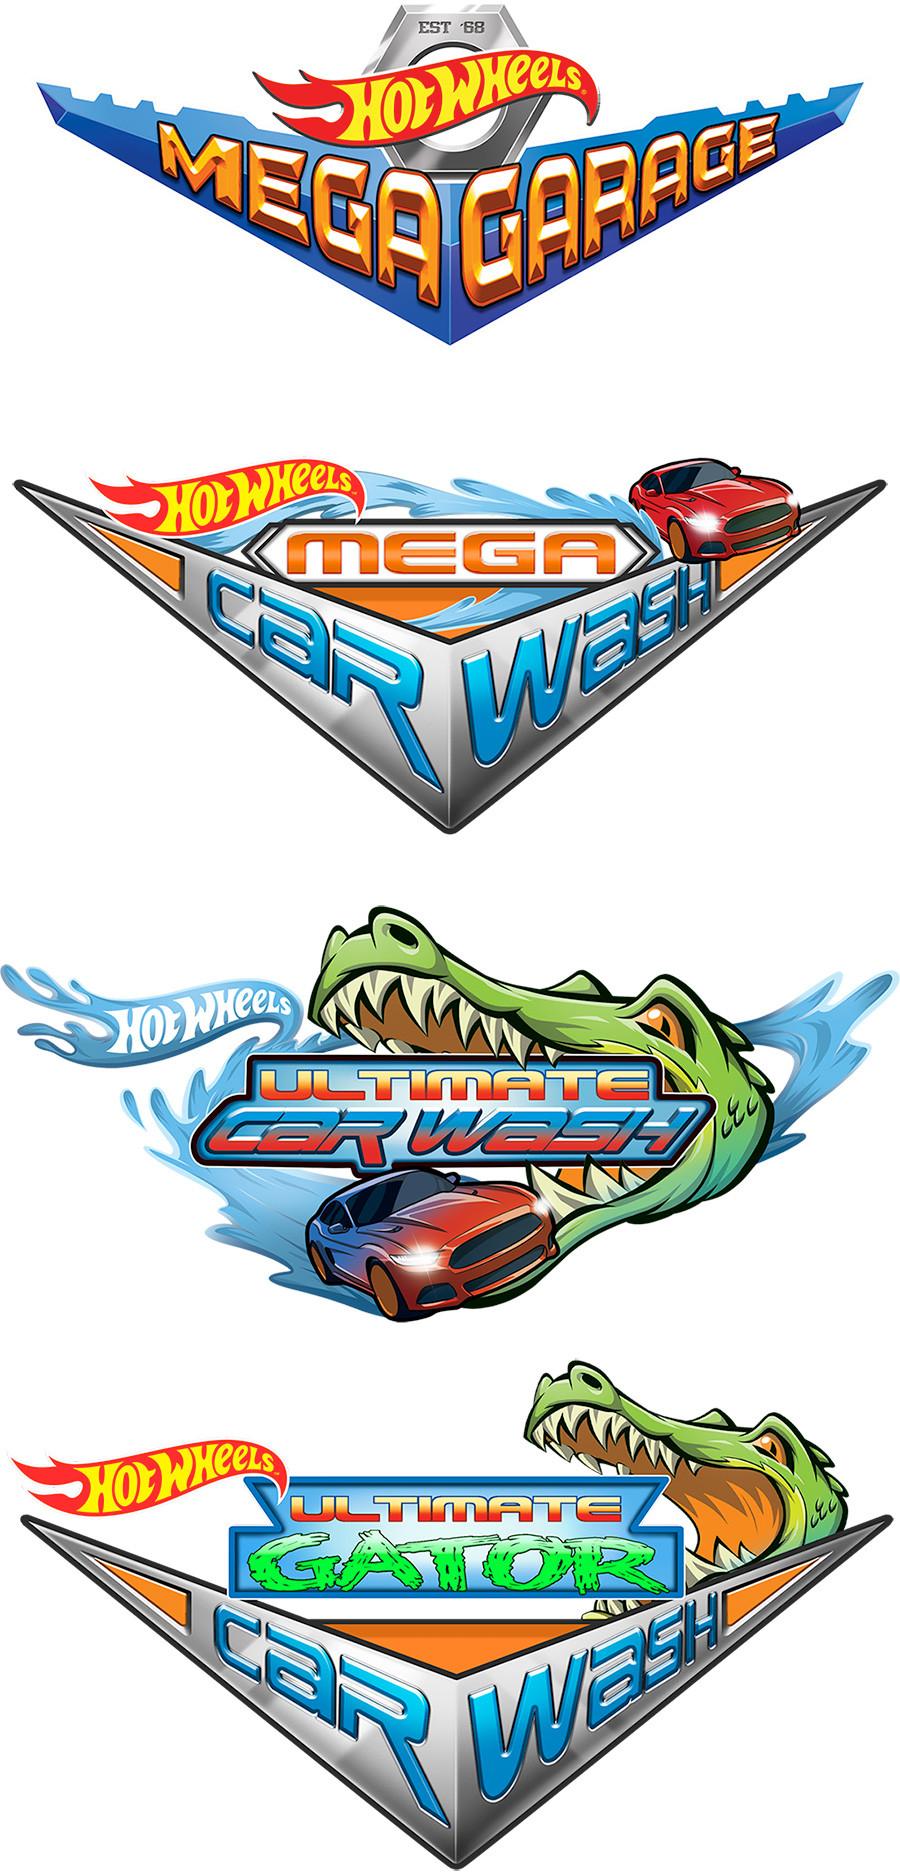 YTE_web20_gallery_pack_HW_logos.jpg